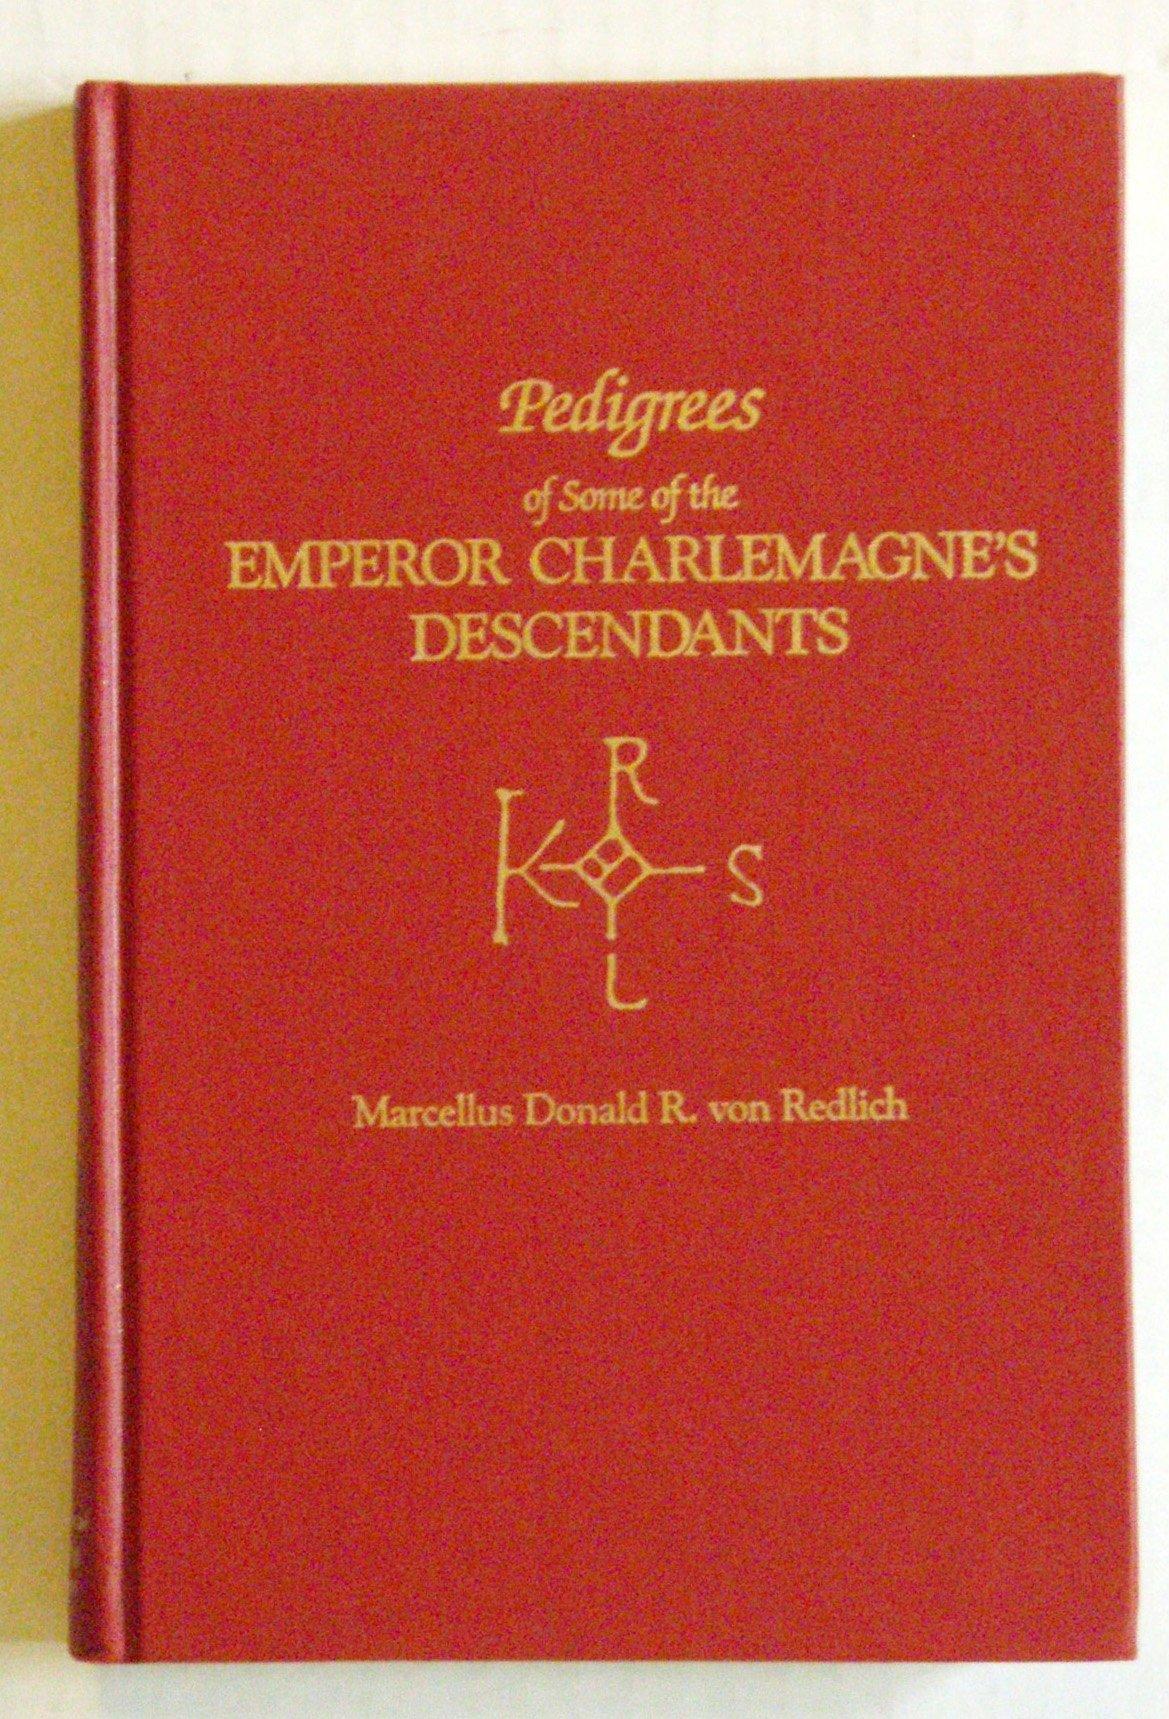 Pedigrees of Emperor Charlemagne's Descendants, Vol. III Hardcover – 2009